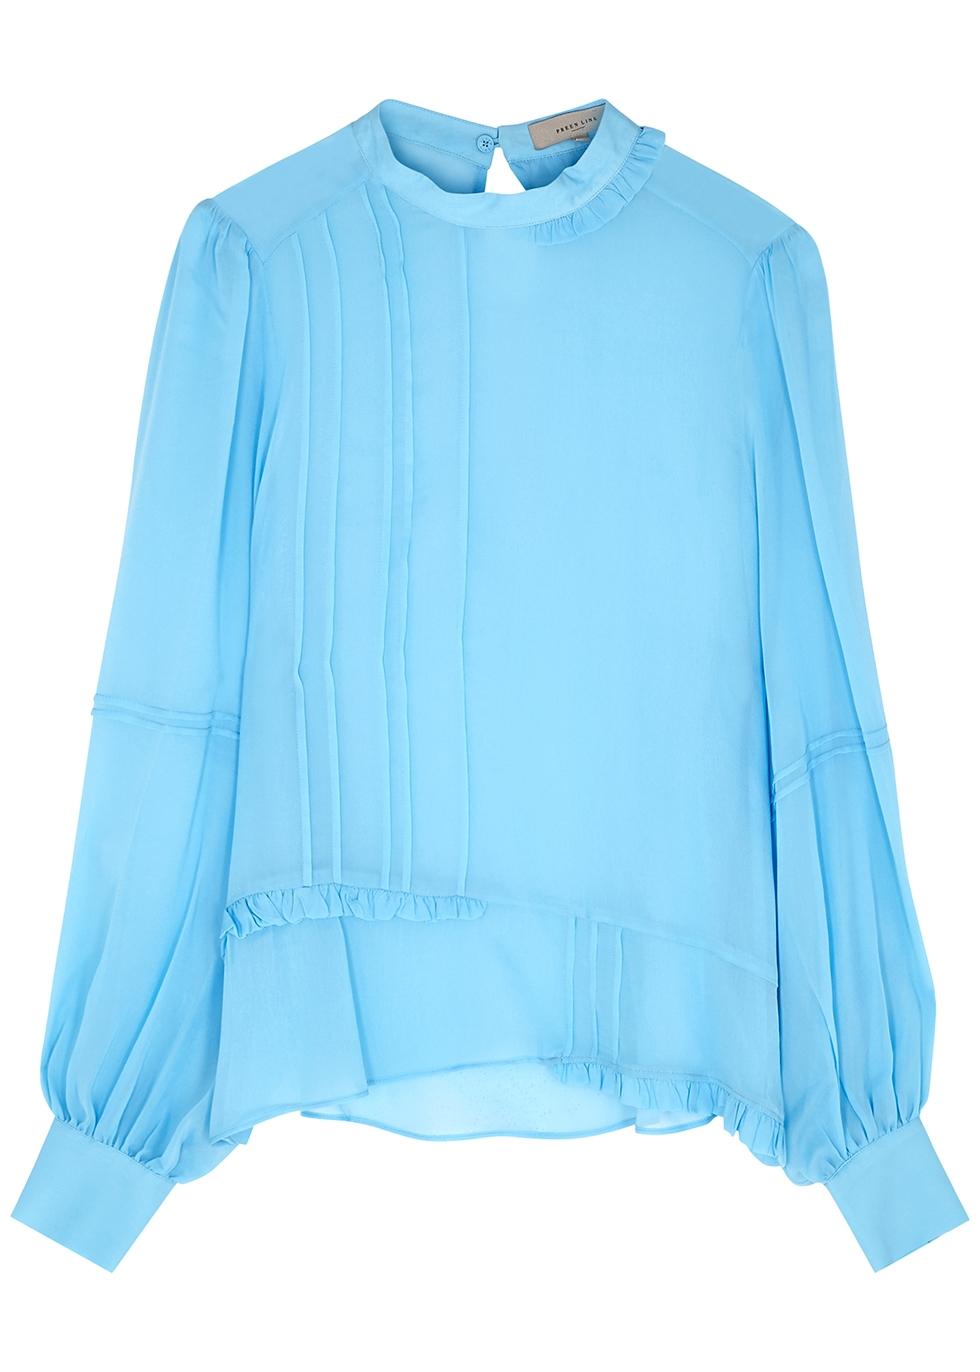 Adeline blue chiffon blouse